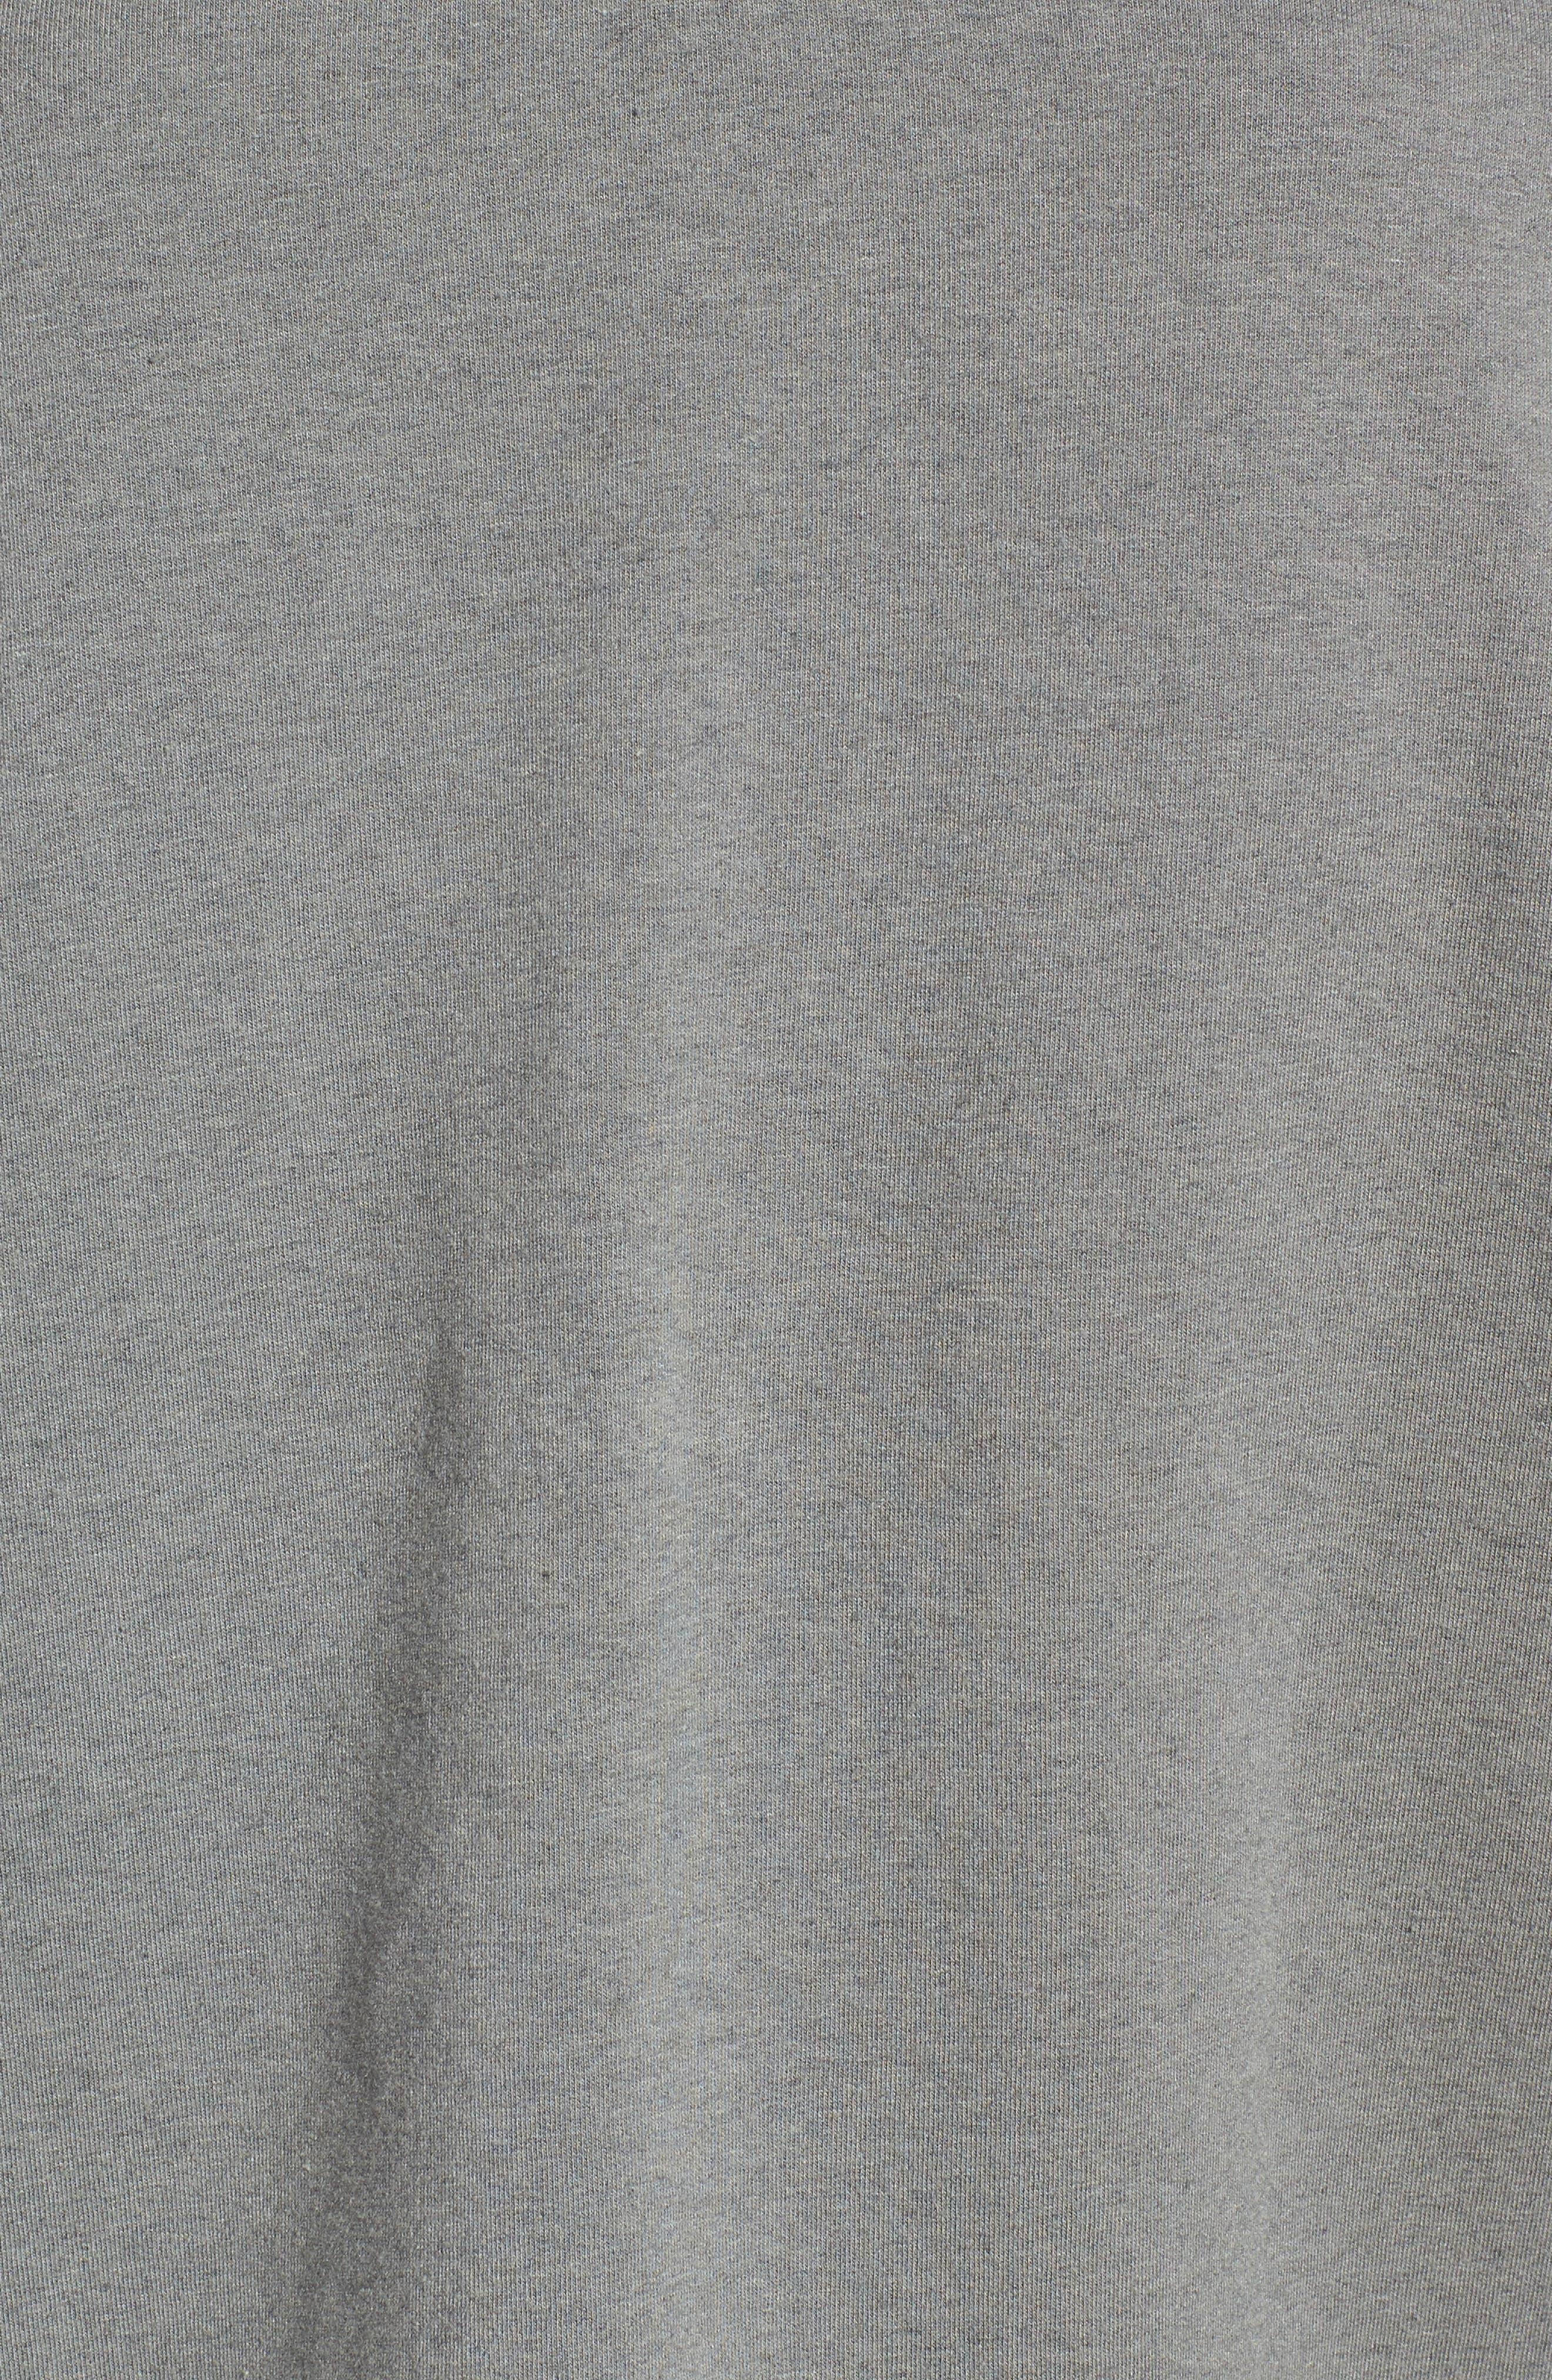 Aerosmith Sweatshirt,                             Alternate thumbnail 6, color,                             Clay